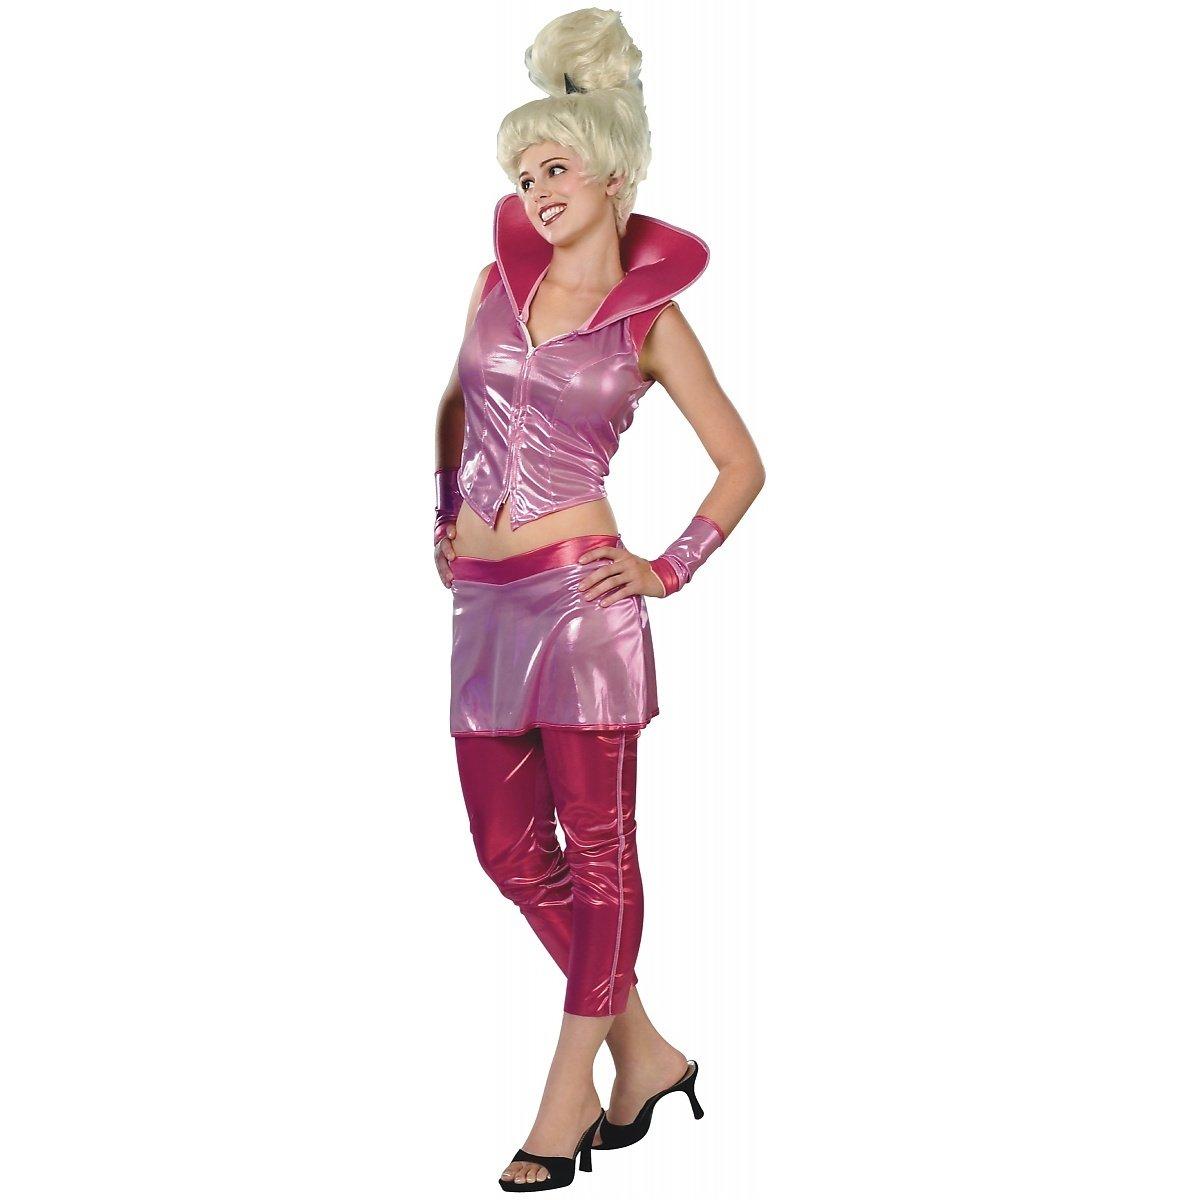 Judy Jetson Halloween Costume